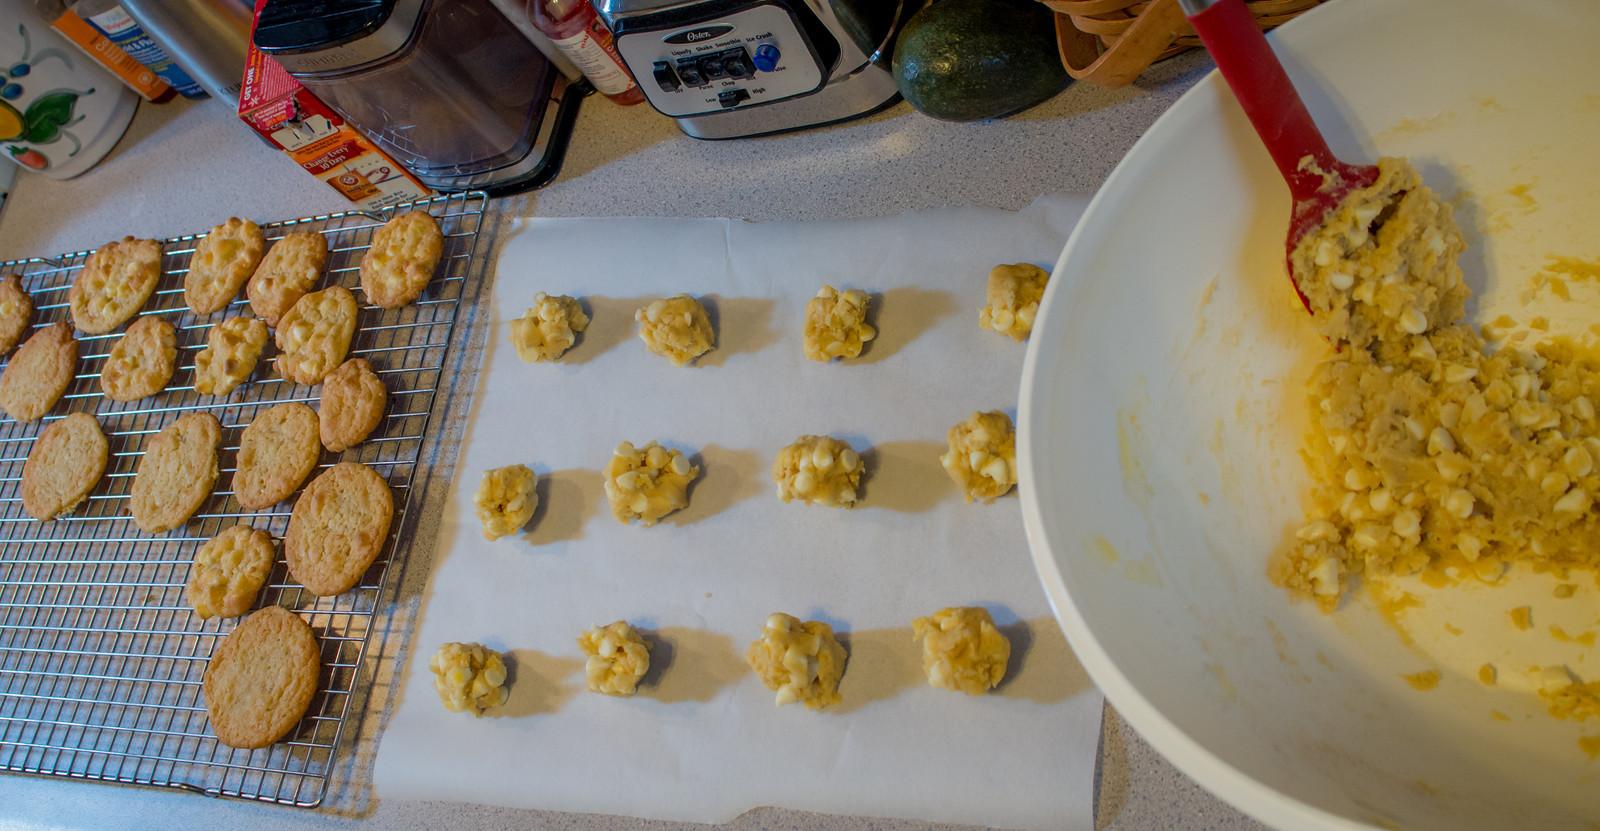 20140302-Baking Cookies-PMG_4683-X3.jpg